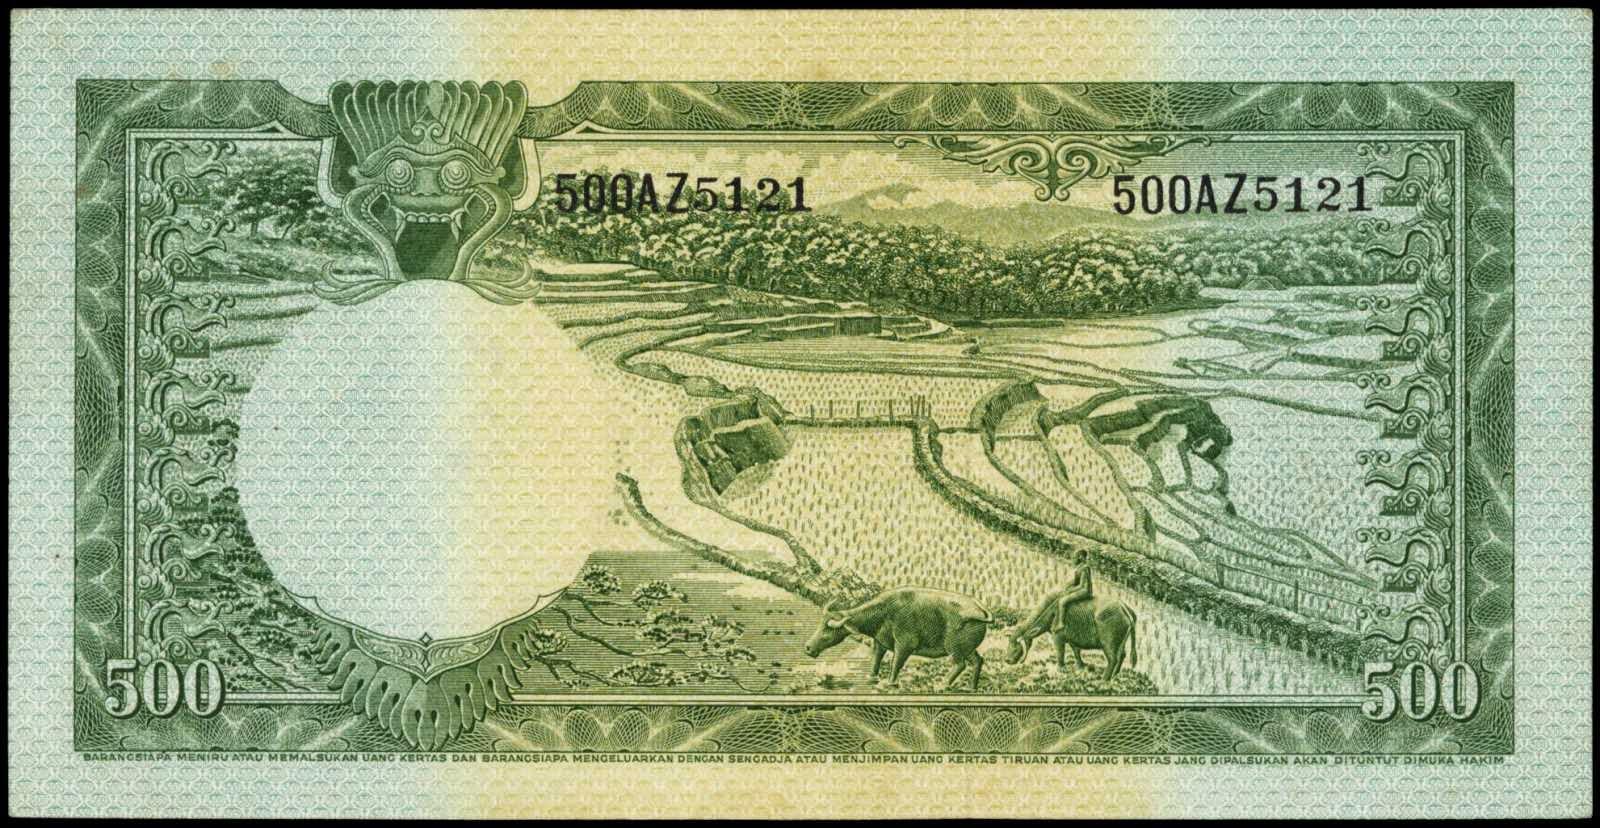 Indonesia paper money currency 500 Rupiah banknote 1957 Animal Series